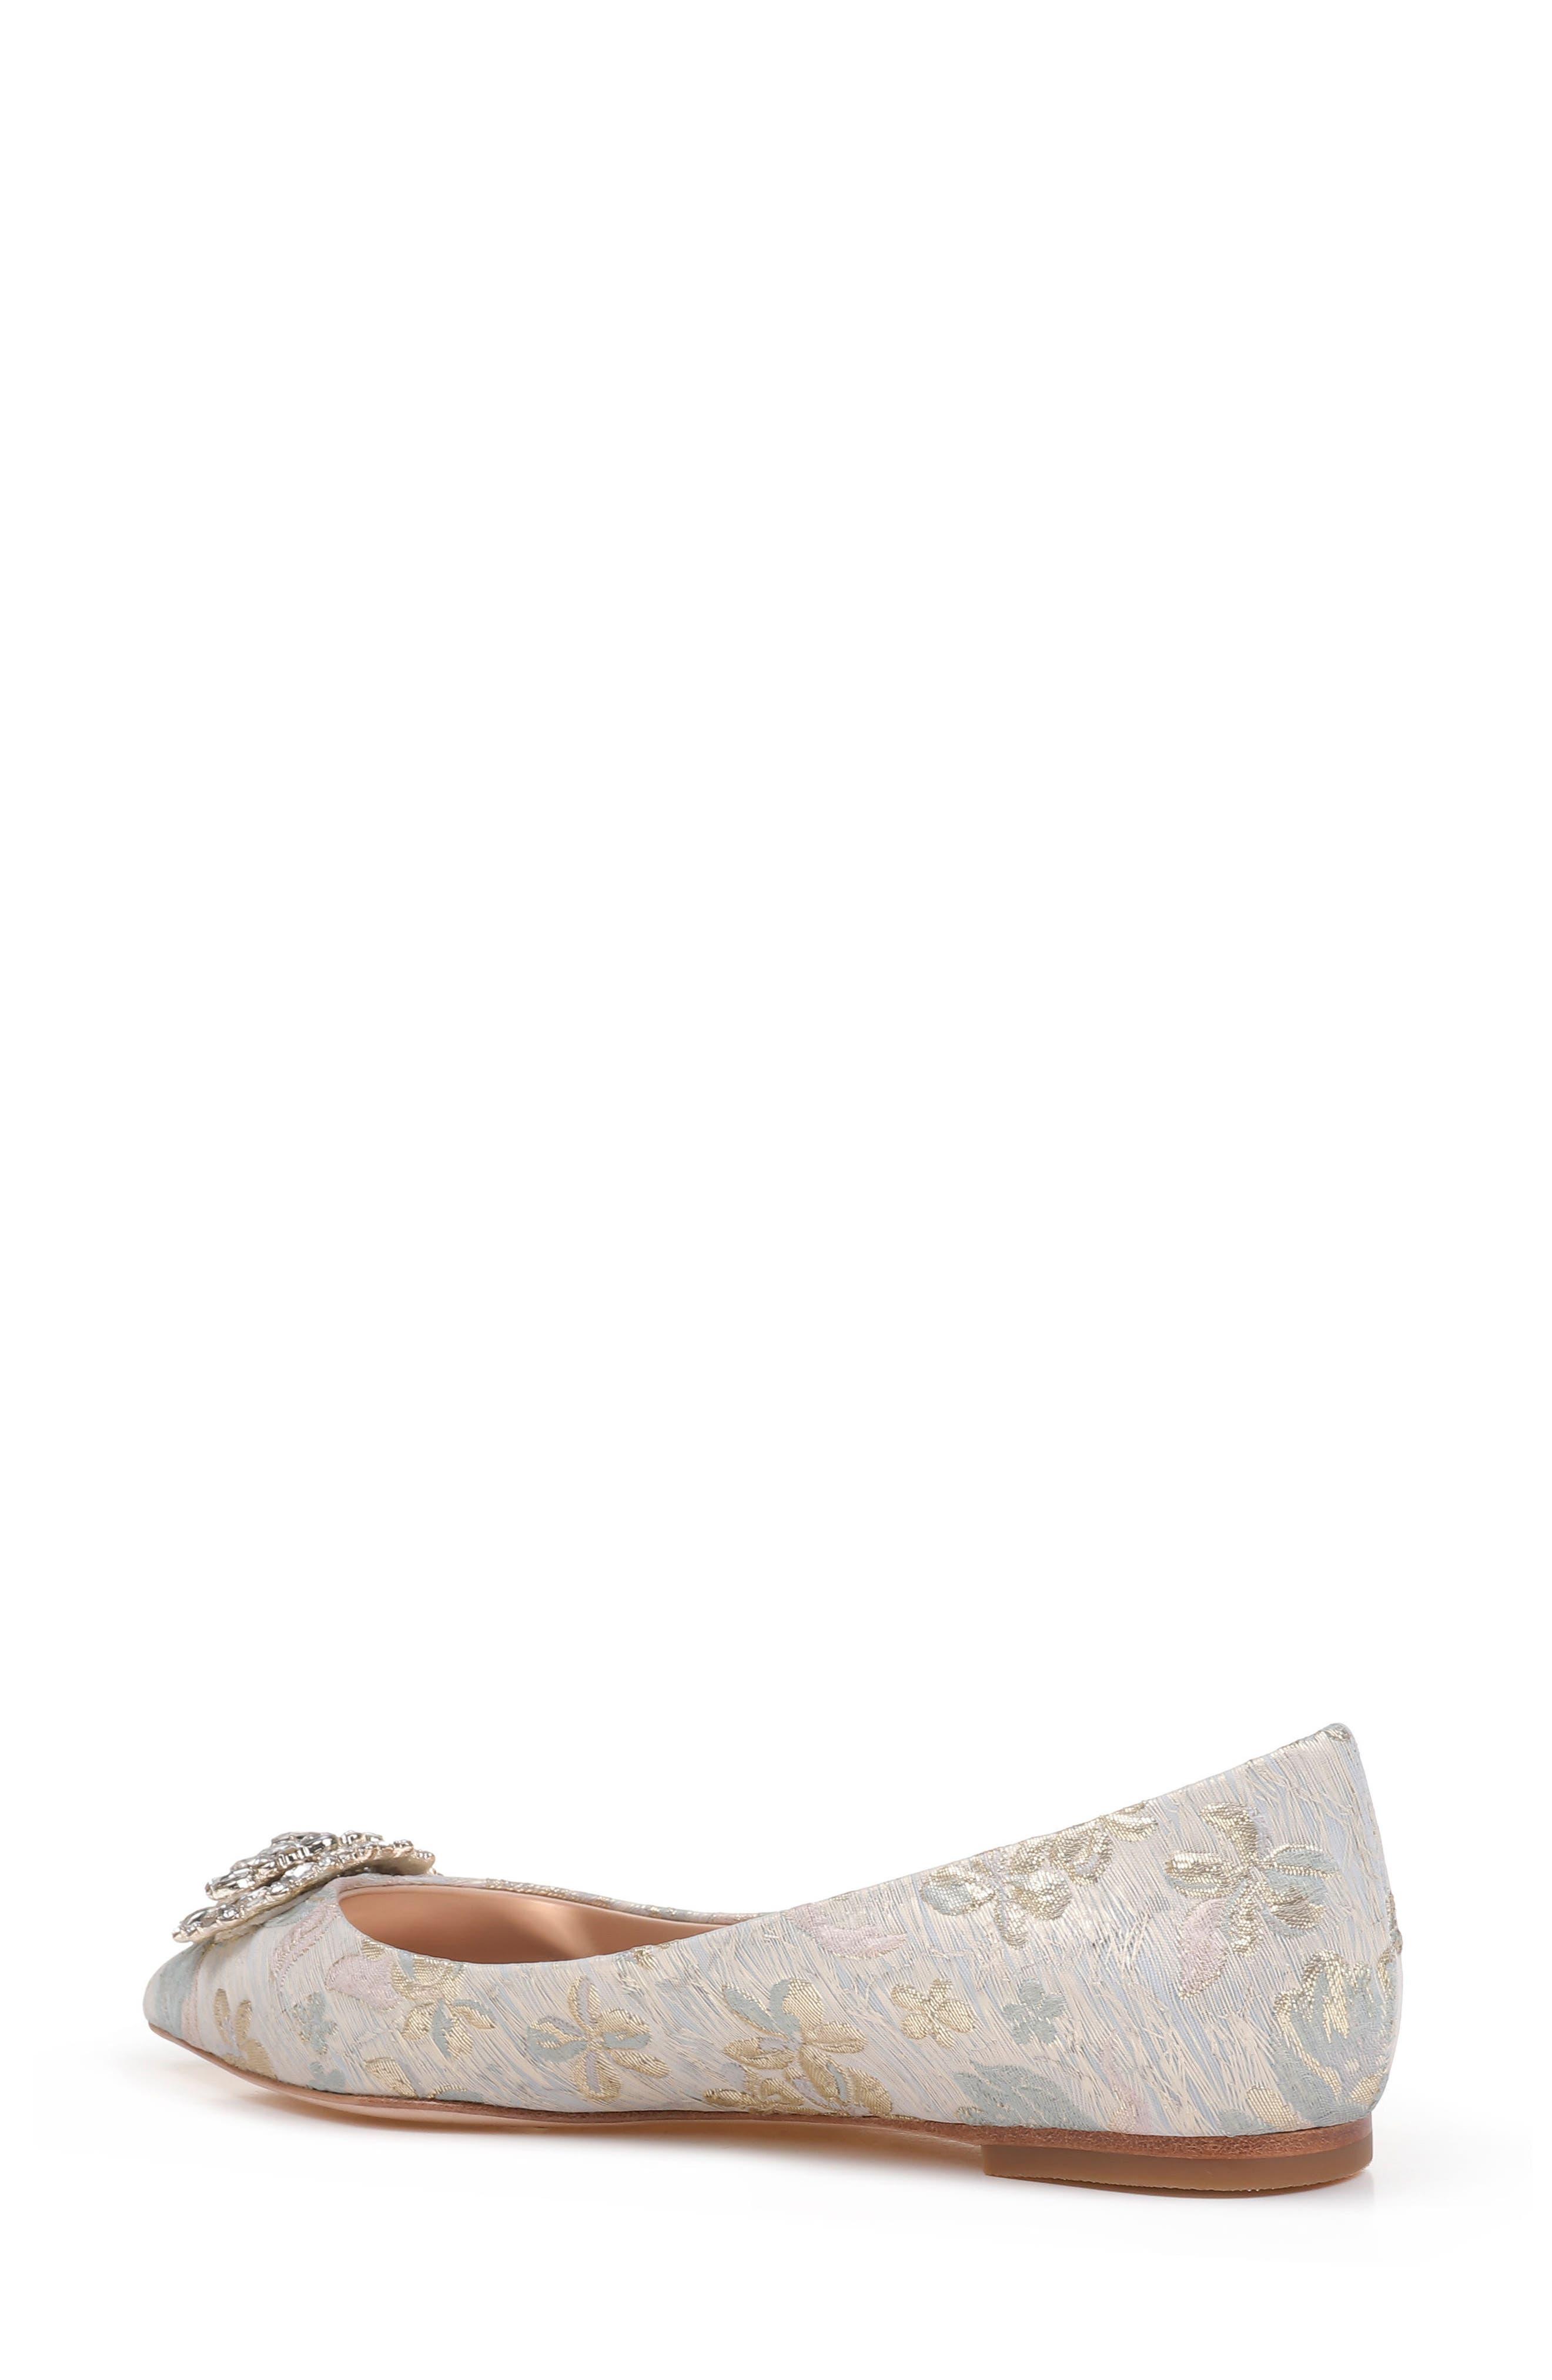 'Davis' Crystal Embellished Pointy Toe Flat,                             Alternate thumbnail 2, color,                             Platino Brocade Fabric